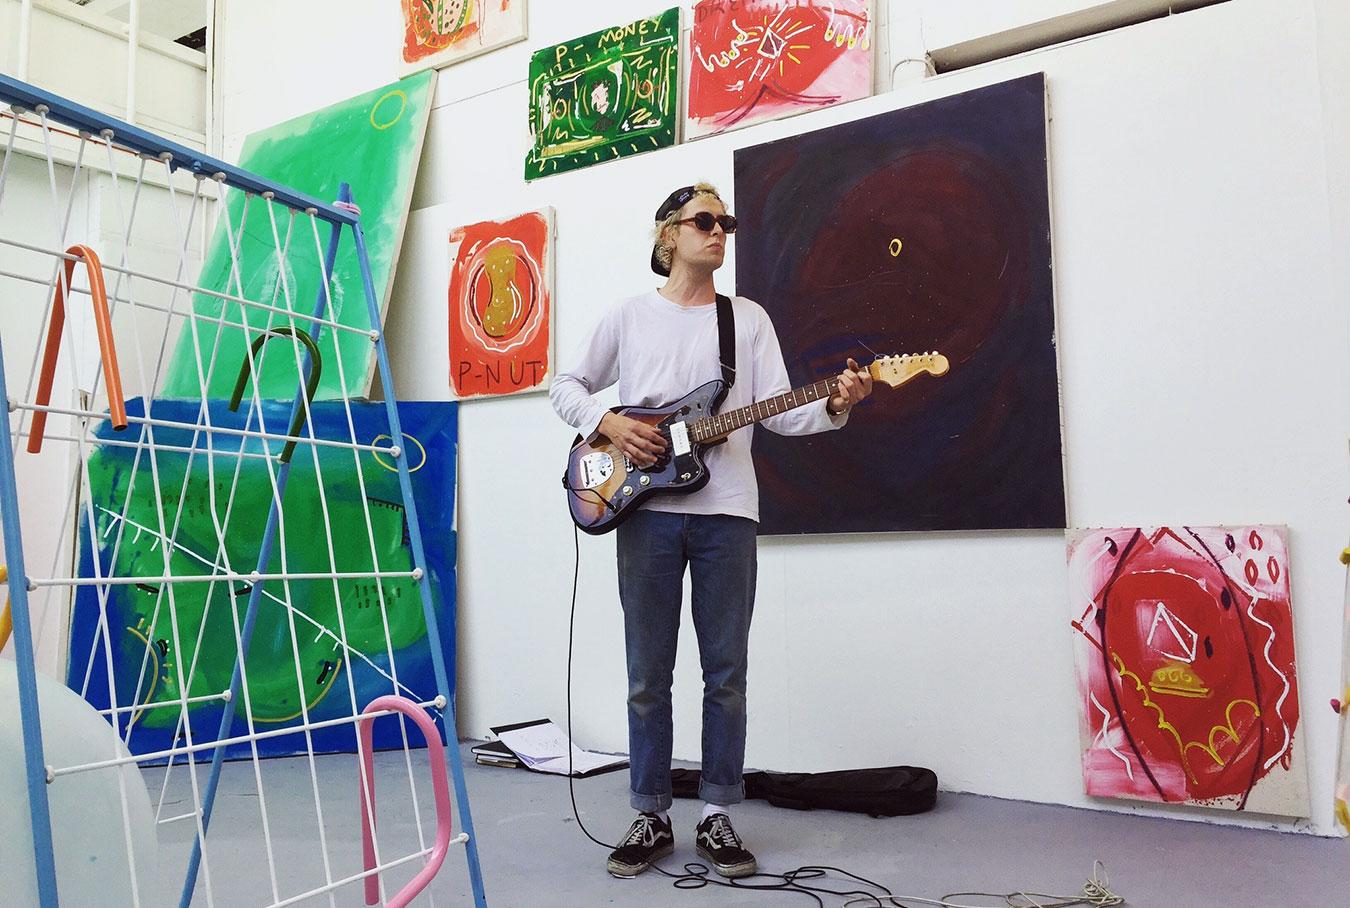 Harry plays guitar - Fine Art exhibition